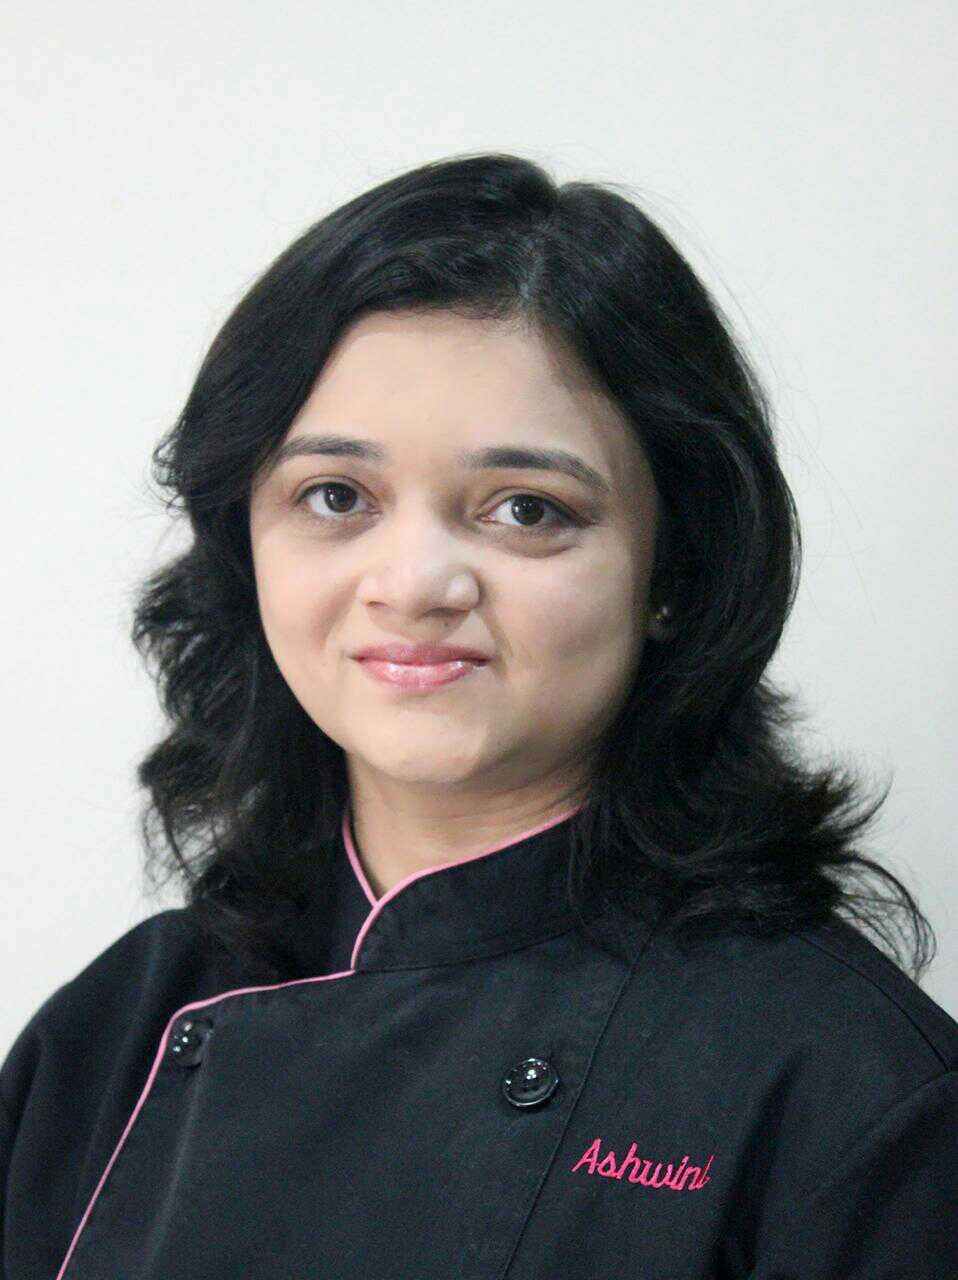 Cake Artist Ashwini Sarabhai's – Interview